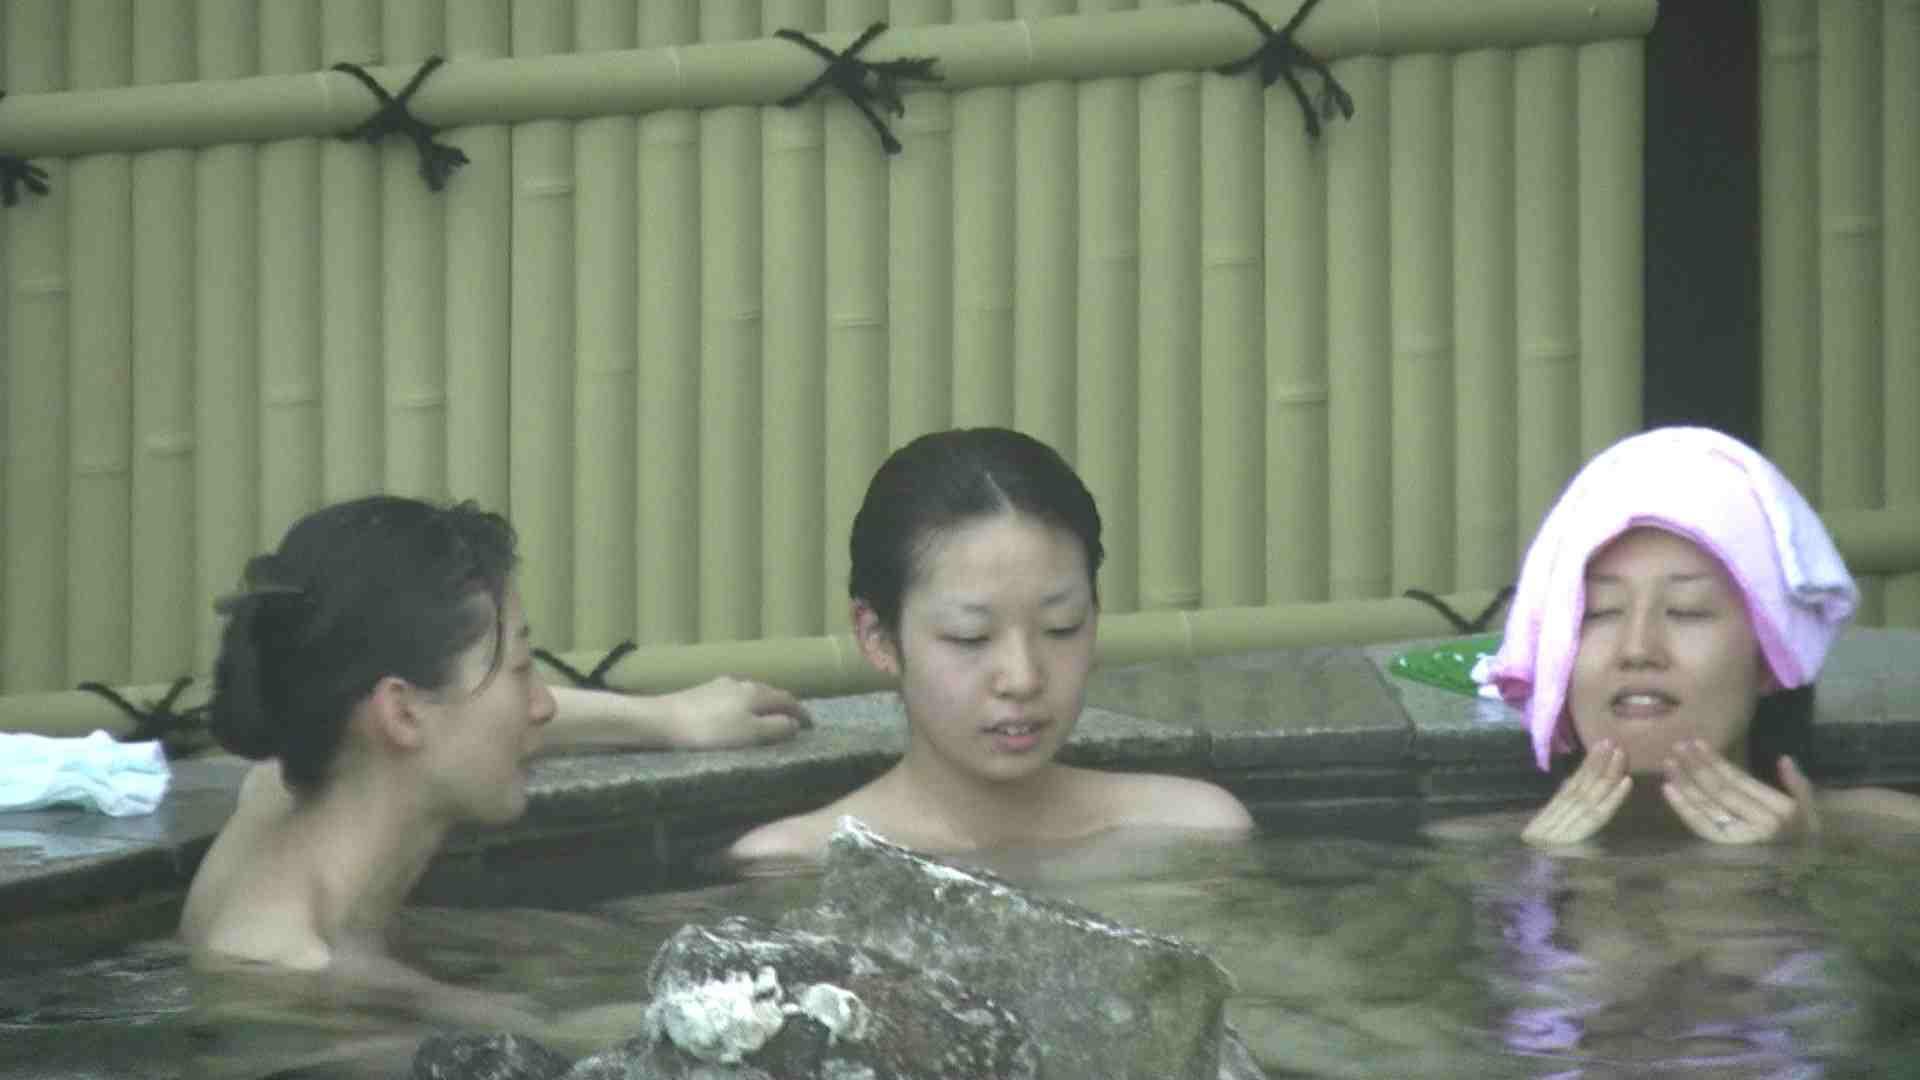 Aquaな露天風呂Vol.195 OLセックス 盗撮ワレメ無修正動画無料 71画像 44